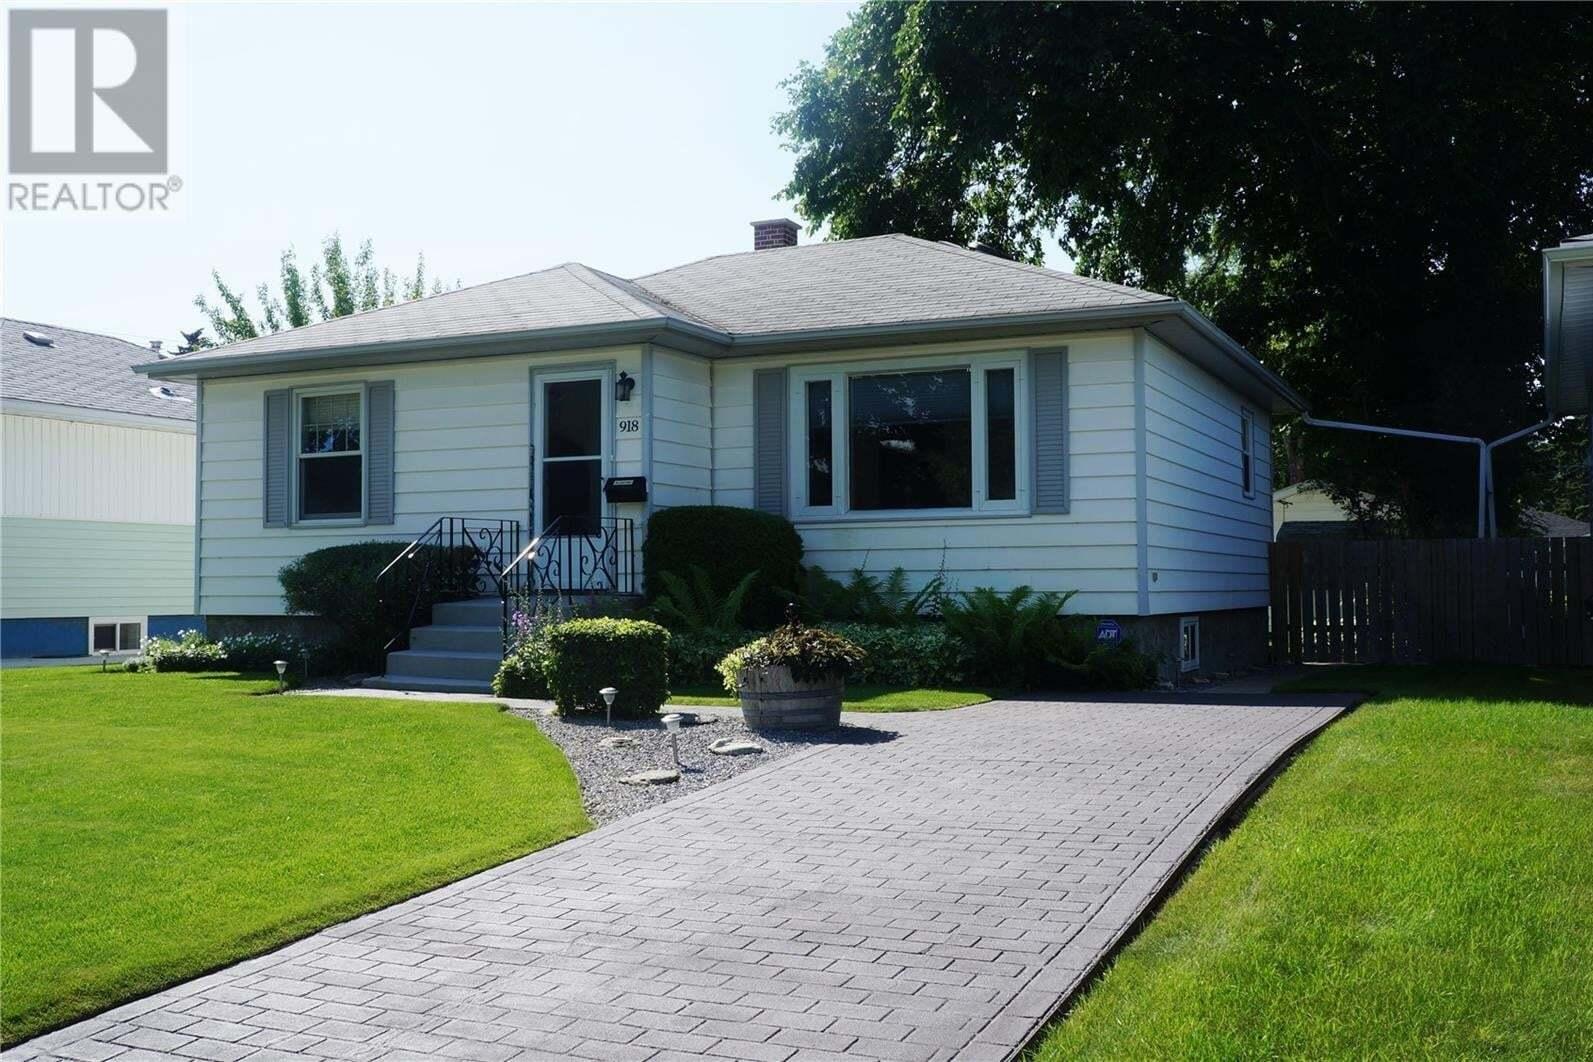 House for sale at 918 2nd St E Saskatoon Saskatchewan - MLS: SK818480